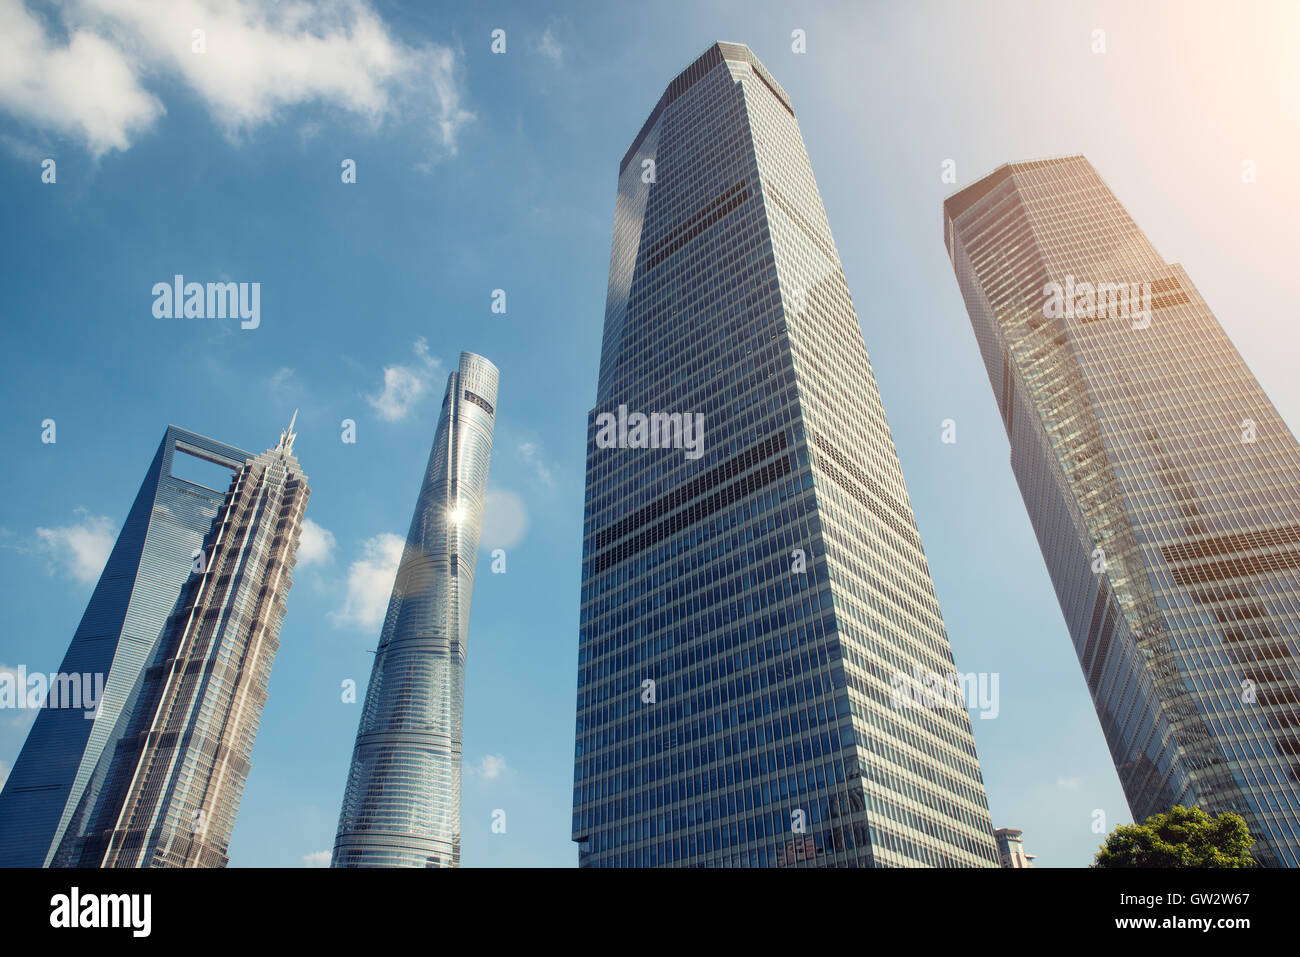 Il grattacielo di Shanghai in Lujiazui Shanghai il quartiere finanziario in Cina a Shanghai. Immagini Stock